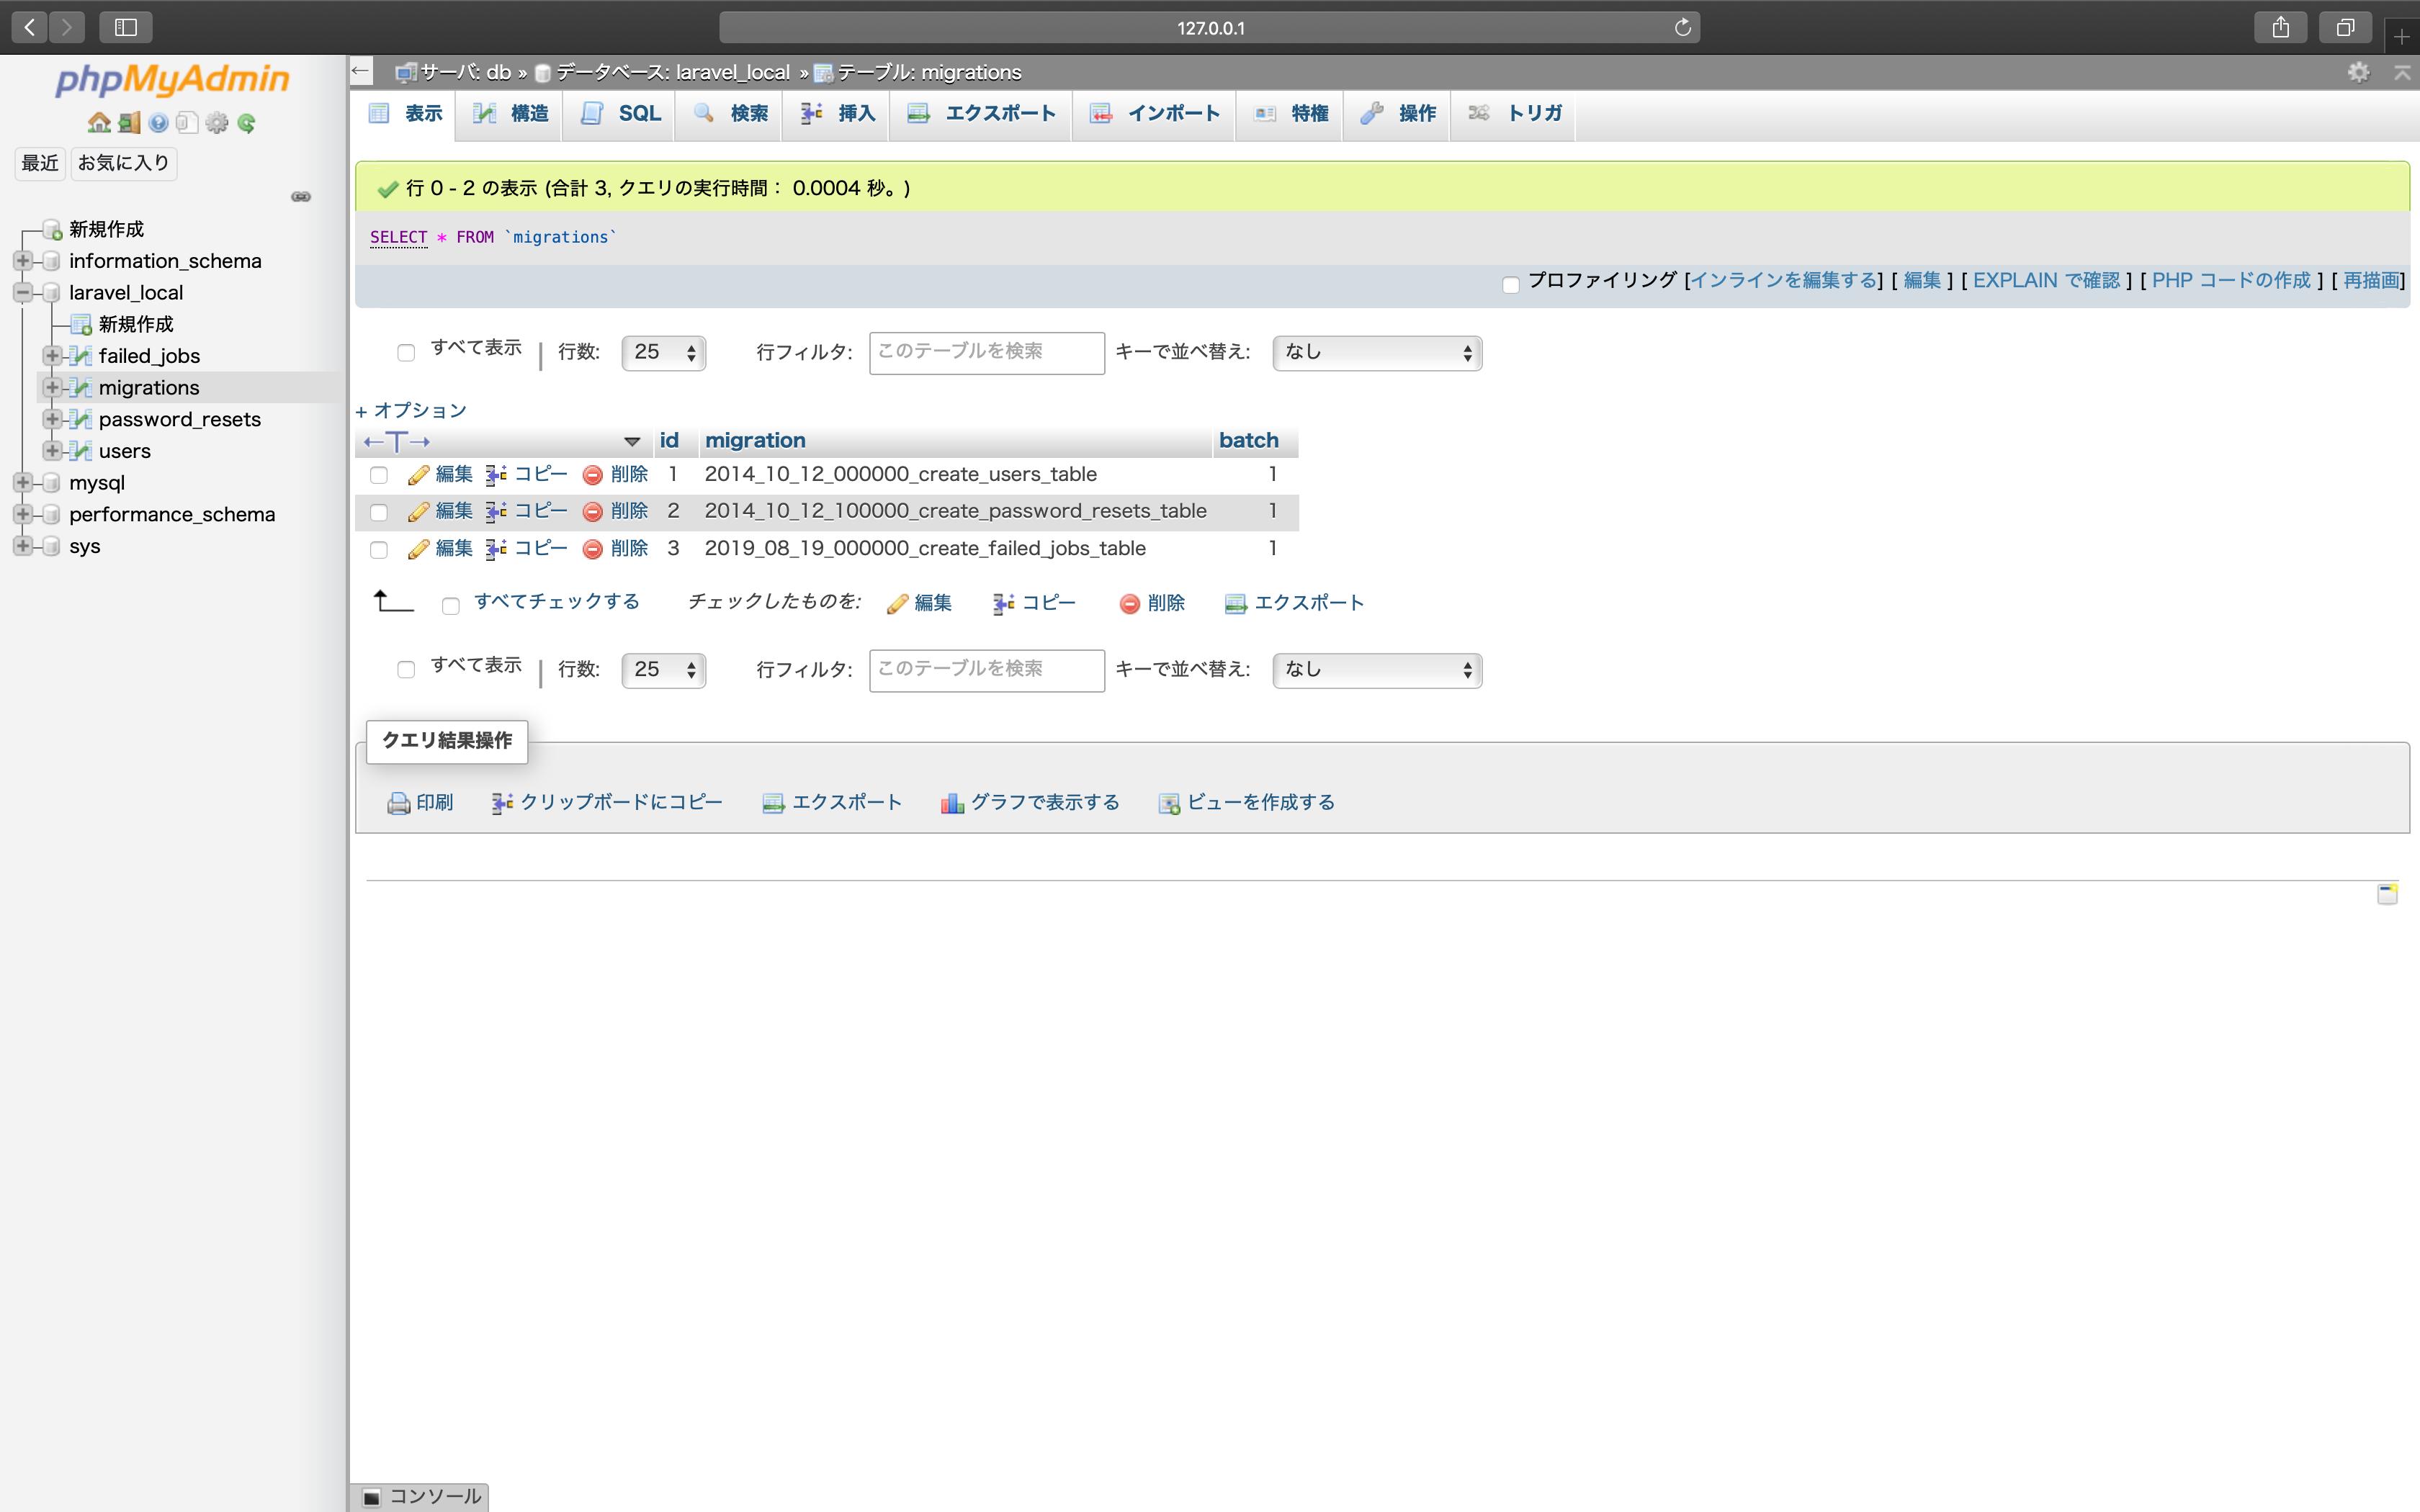 ScreenShot 2020-09-22 19.11.46.png